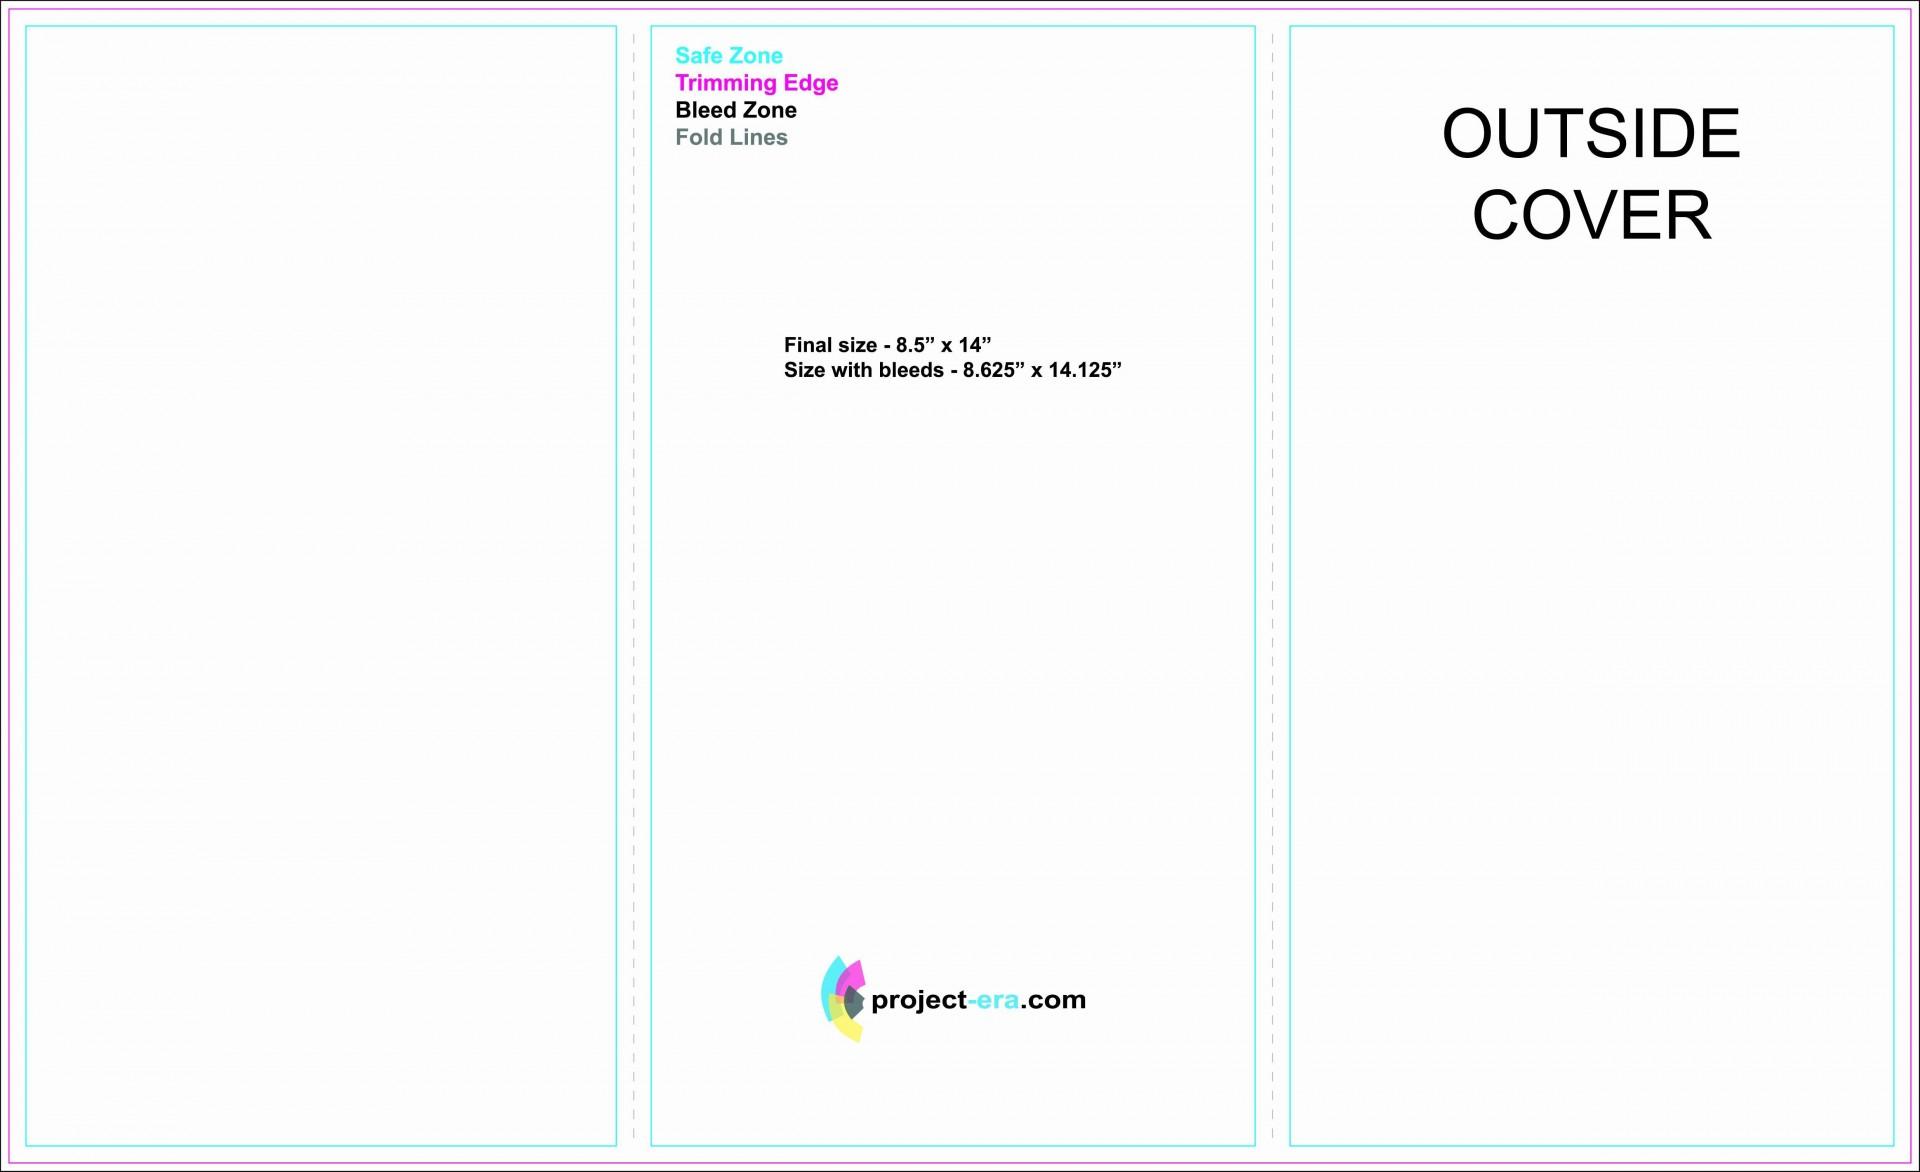 000 Wonderful 3 Fold Brochure Template Free Sample  Word Download1920